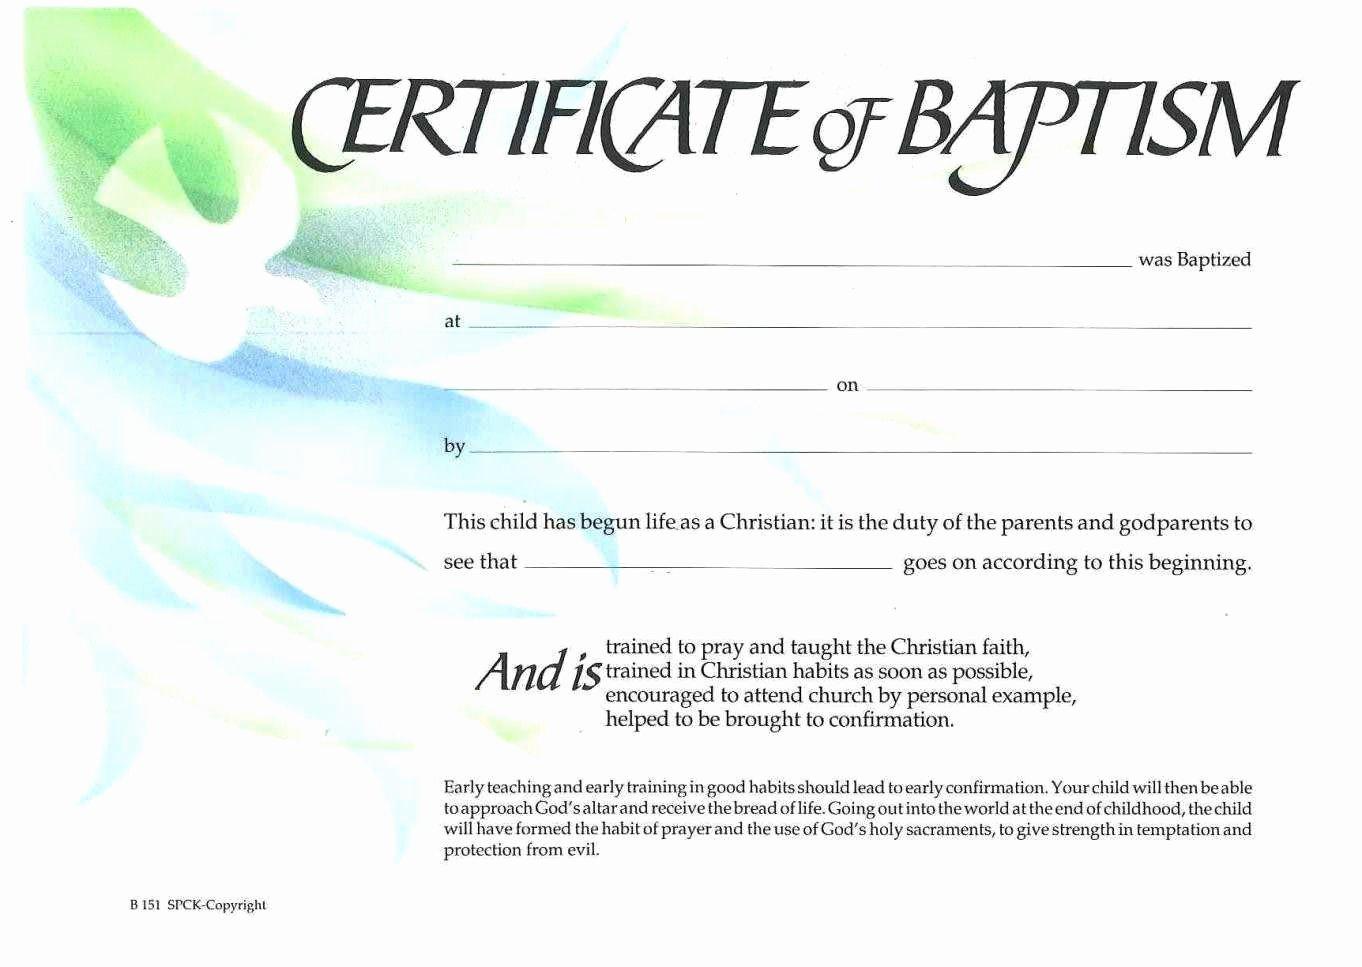 Baptism Certificates Free Download Luxury Sample Baptism Certificate Templates